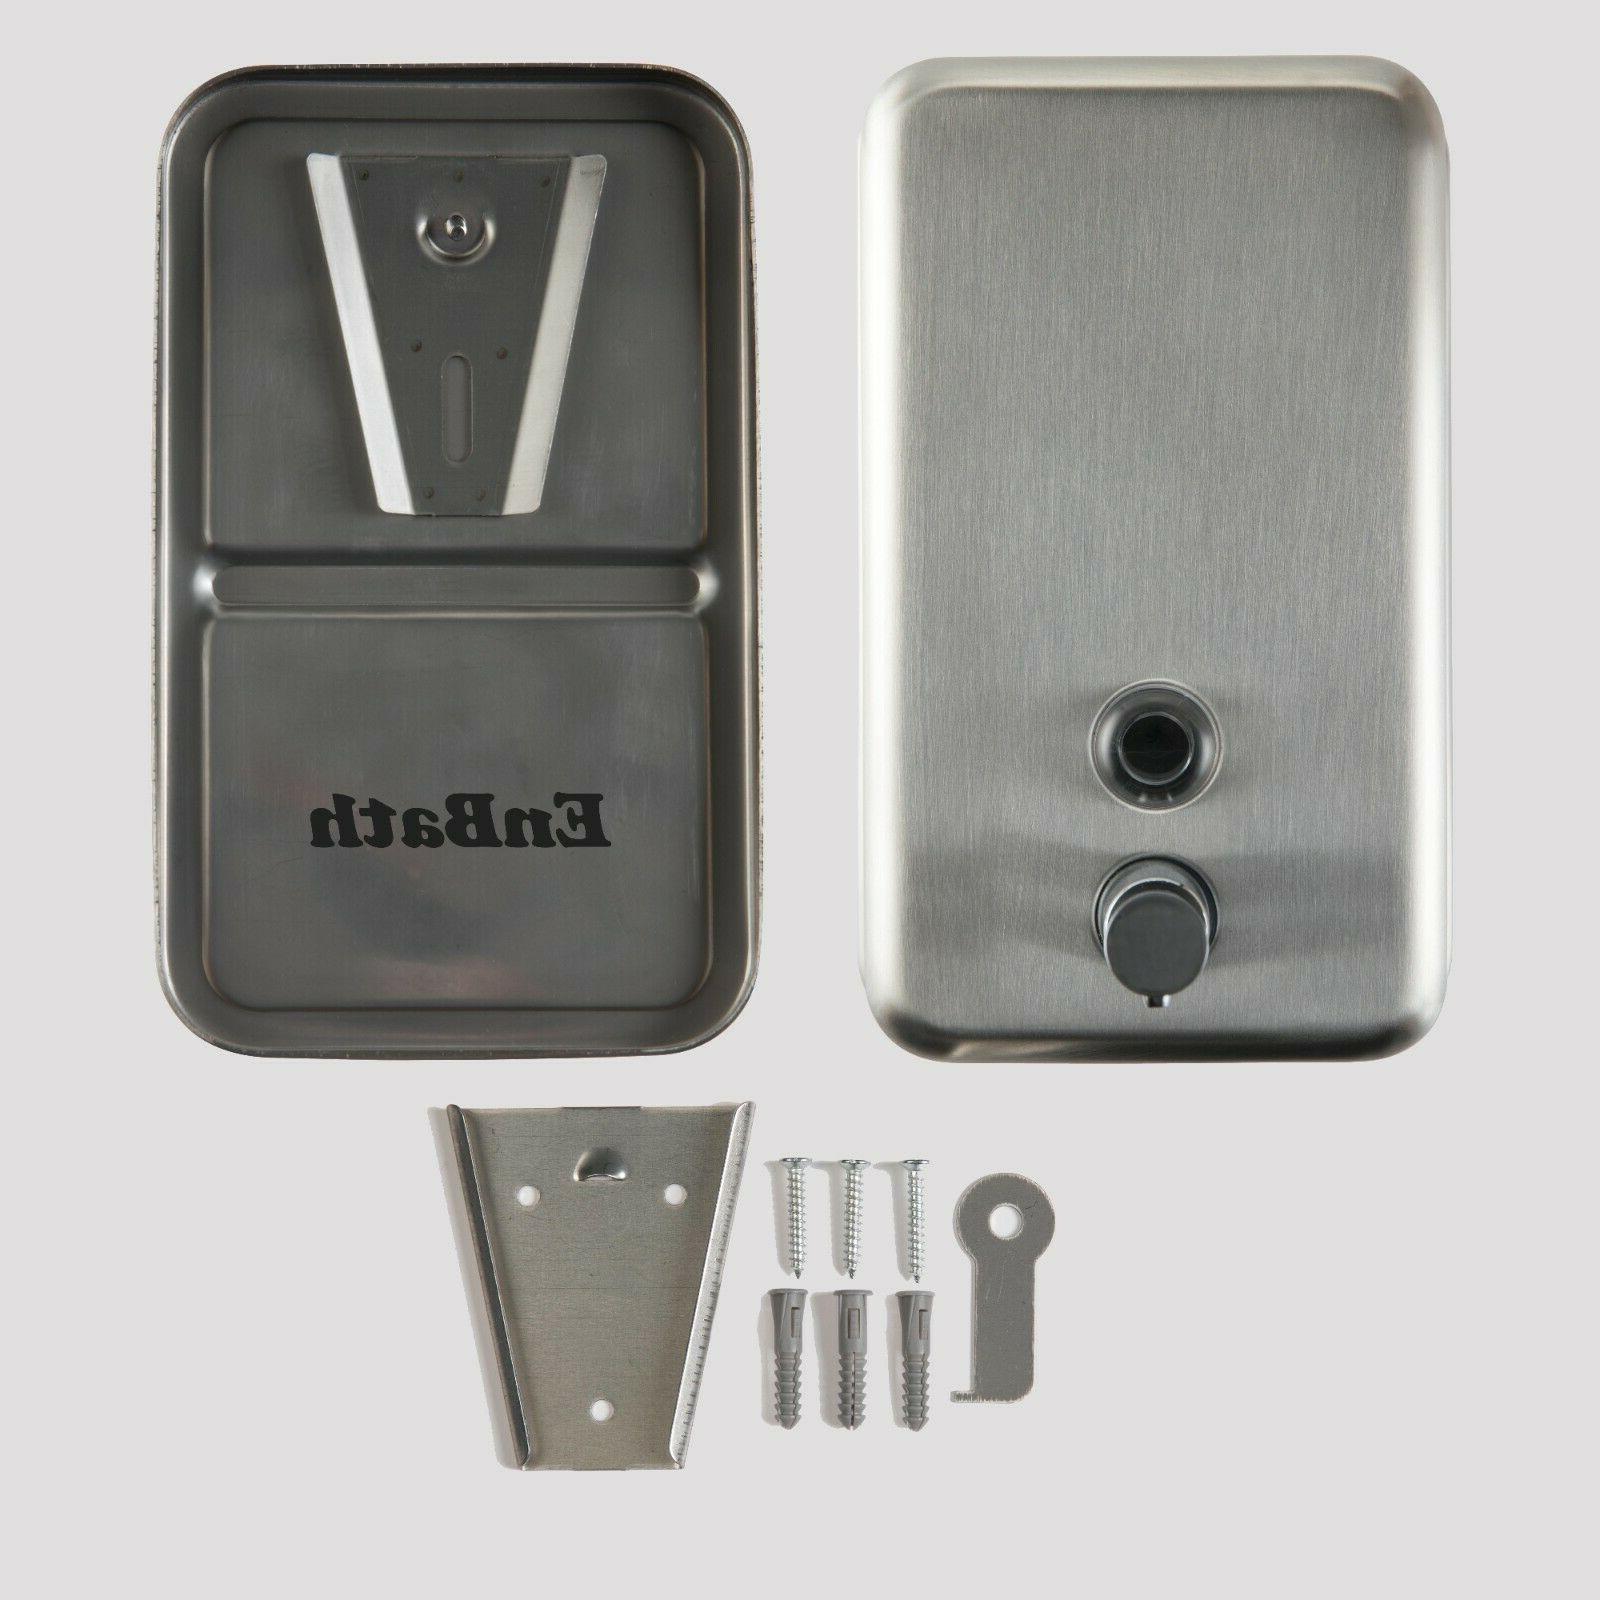 Commercial Soap Dispenser Mount -